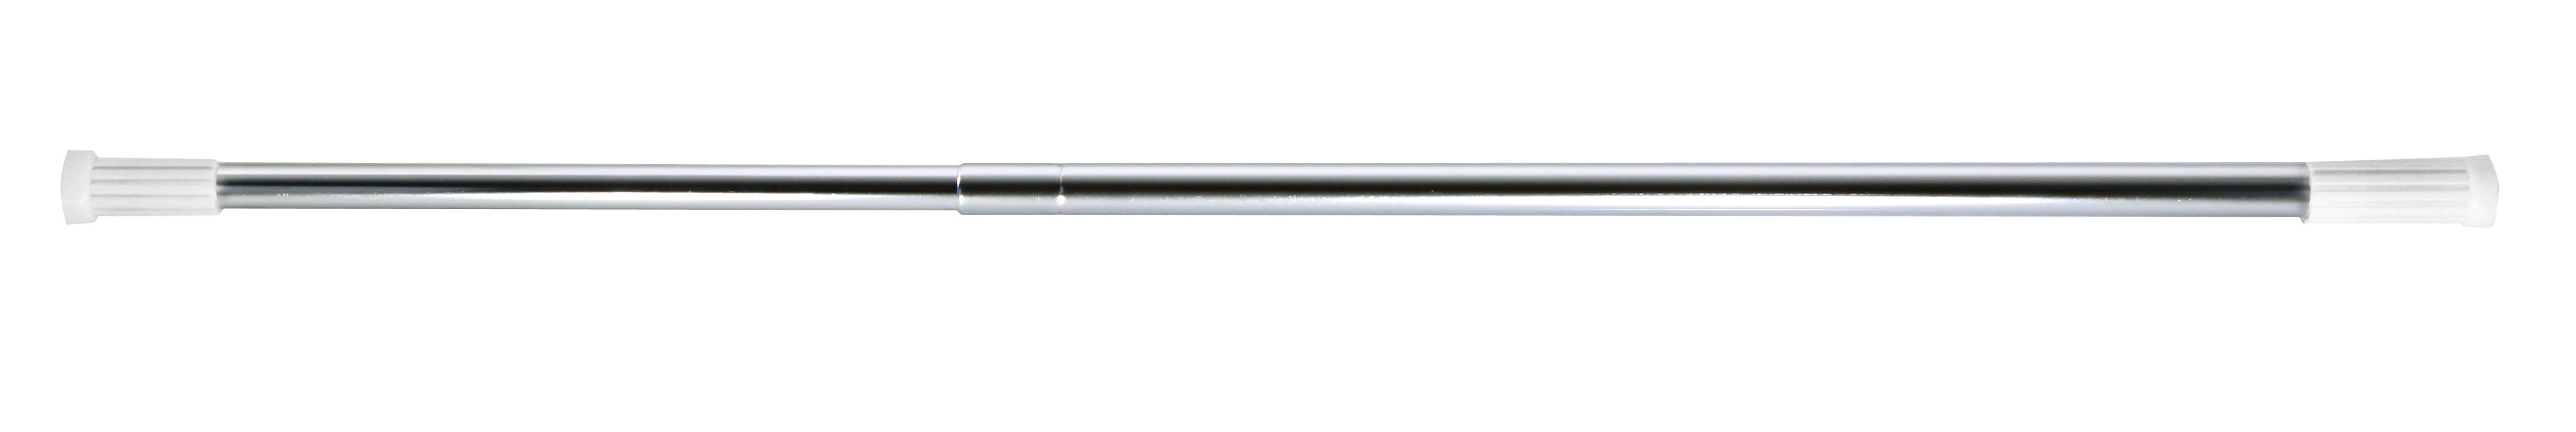 Tyč na sprchový závěs Olsen 140-260 chrom, skladem